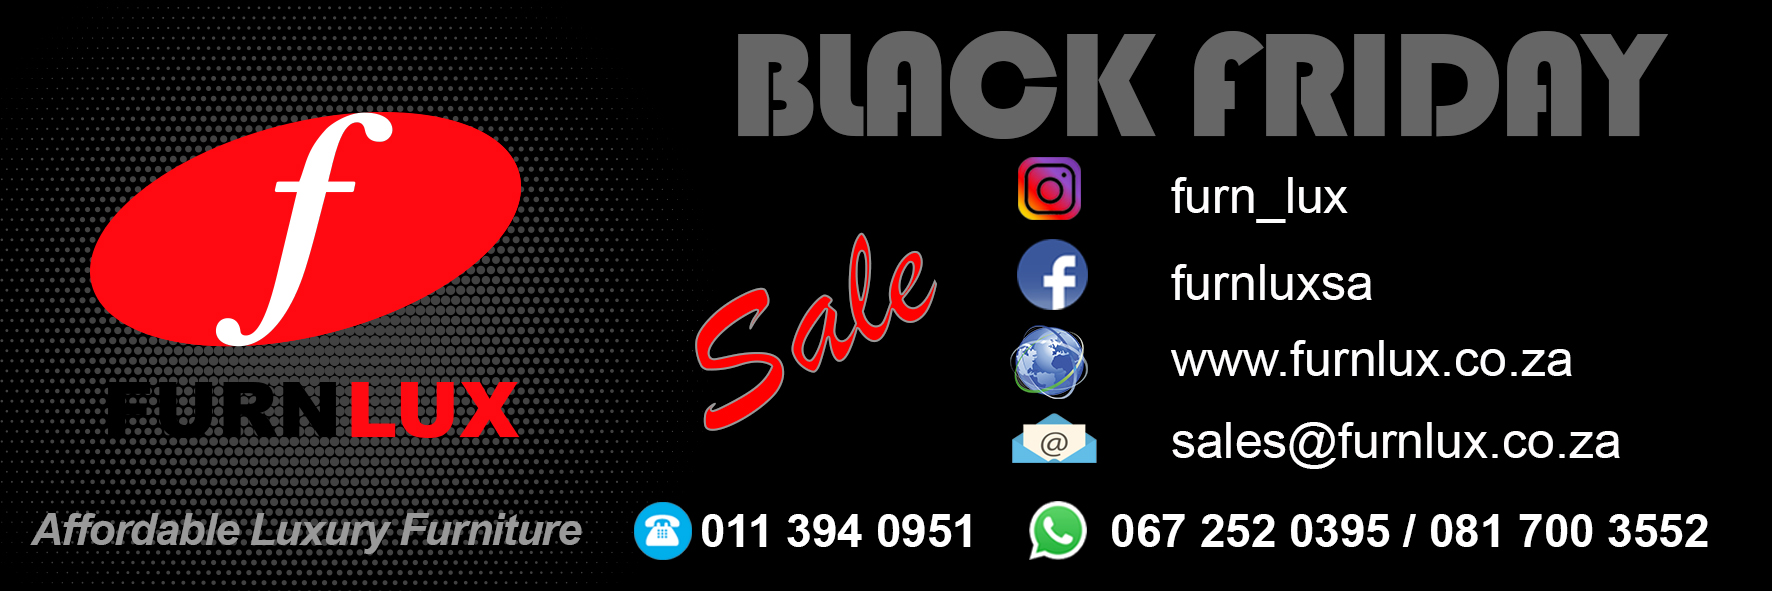 BLACK FRIDAY SPECIAL EVE PEDESTAL BRAND NEW